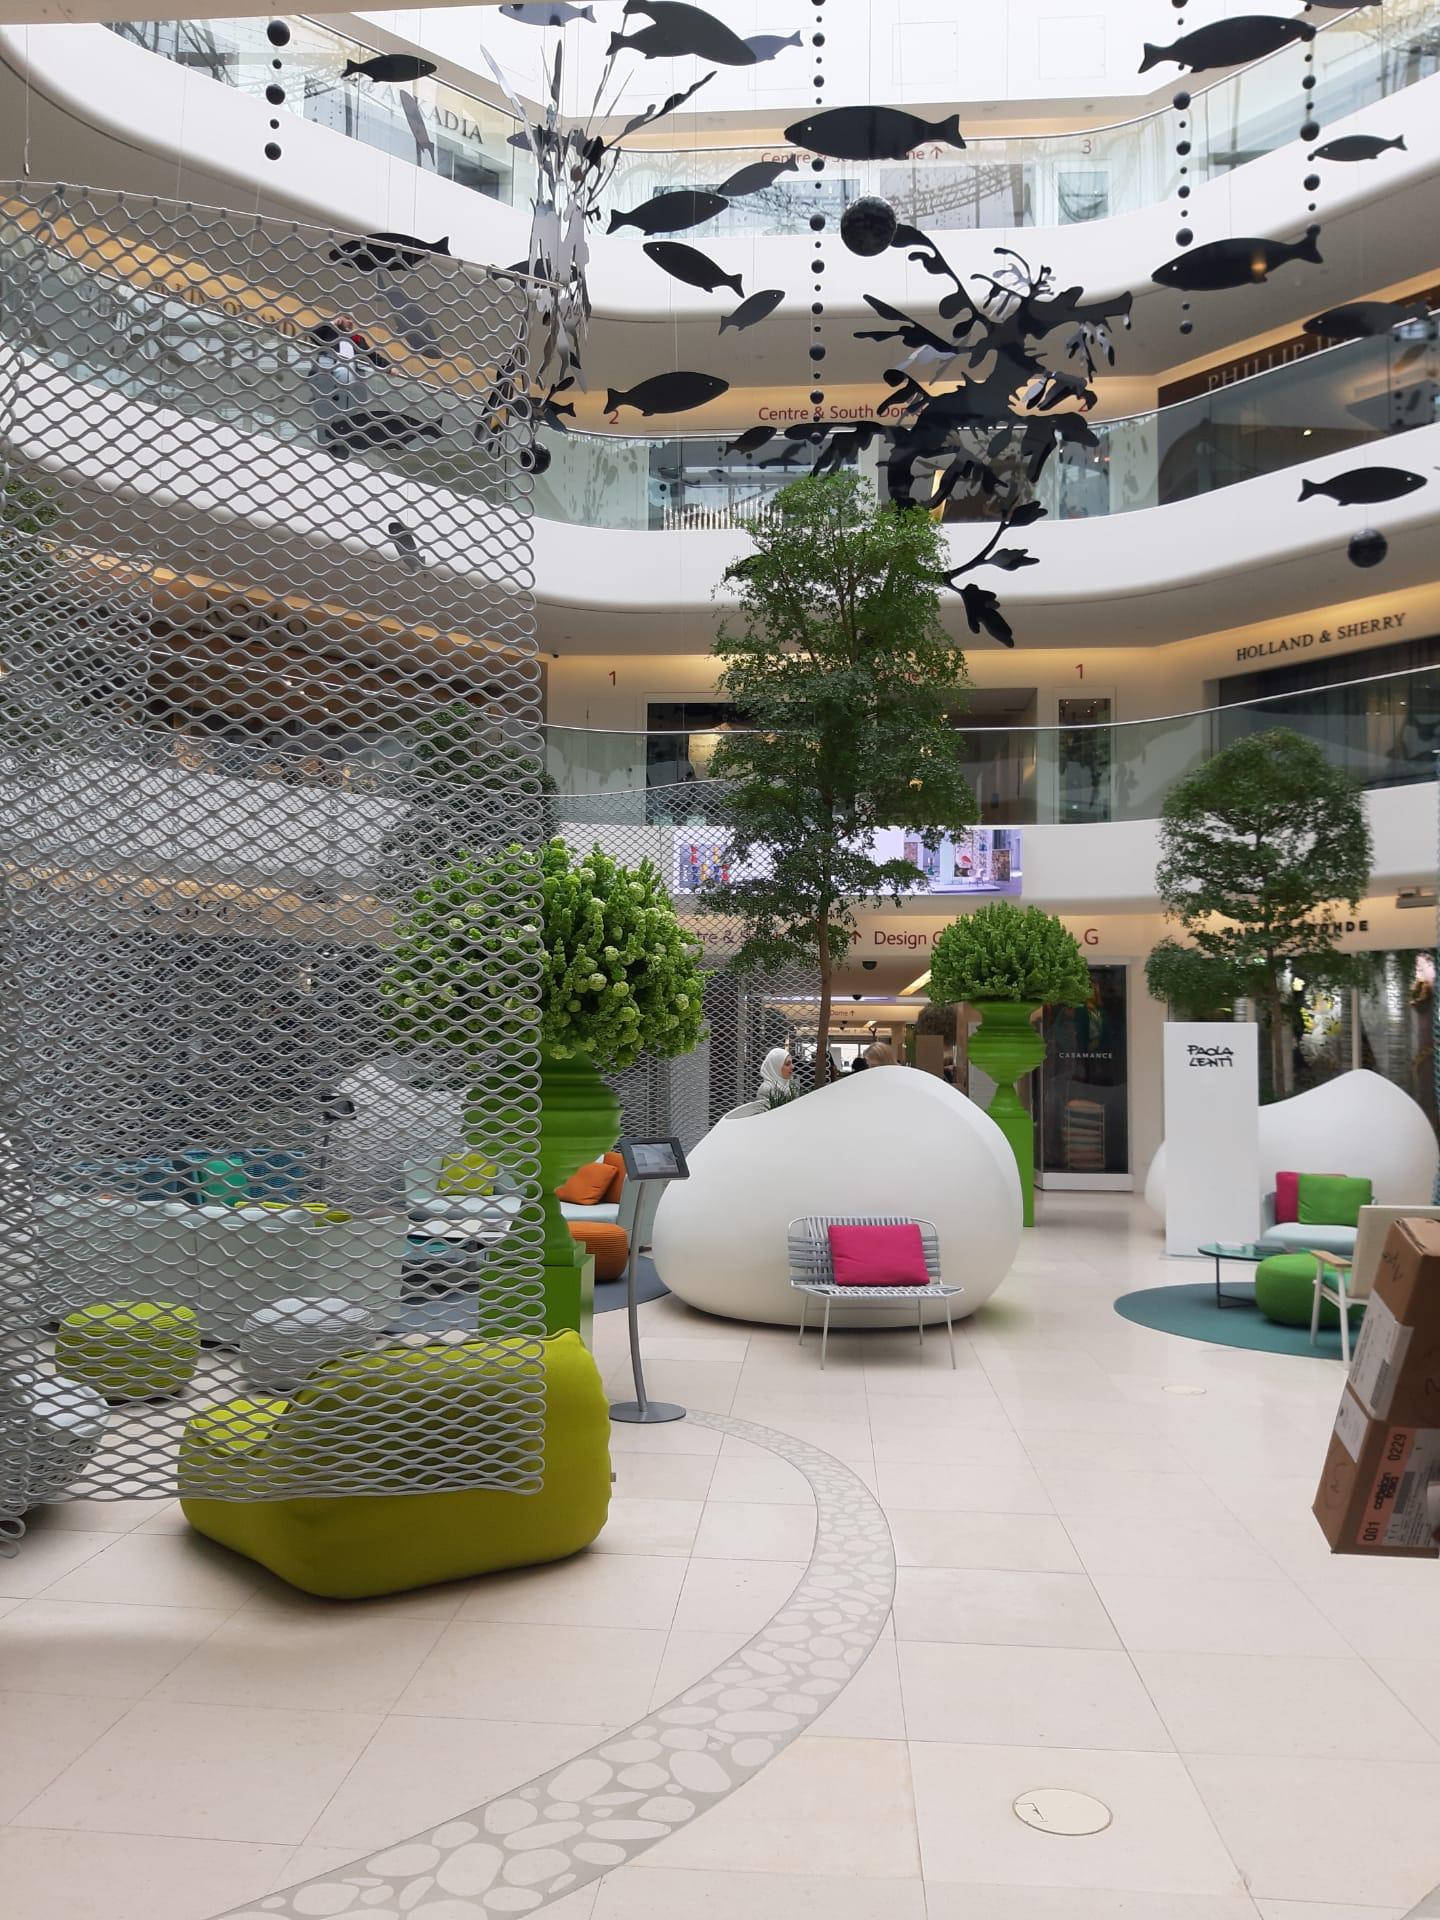 Design Week 2020 in London design week 2020 Design Week 2020 in London WhatsApp Image 2020 03 11 at 12